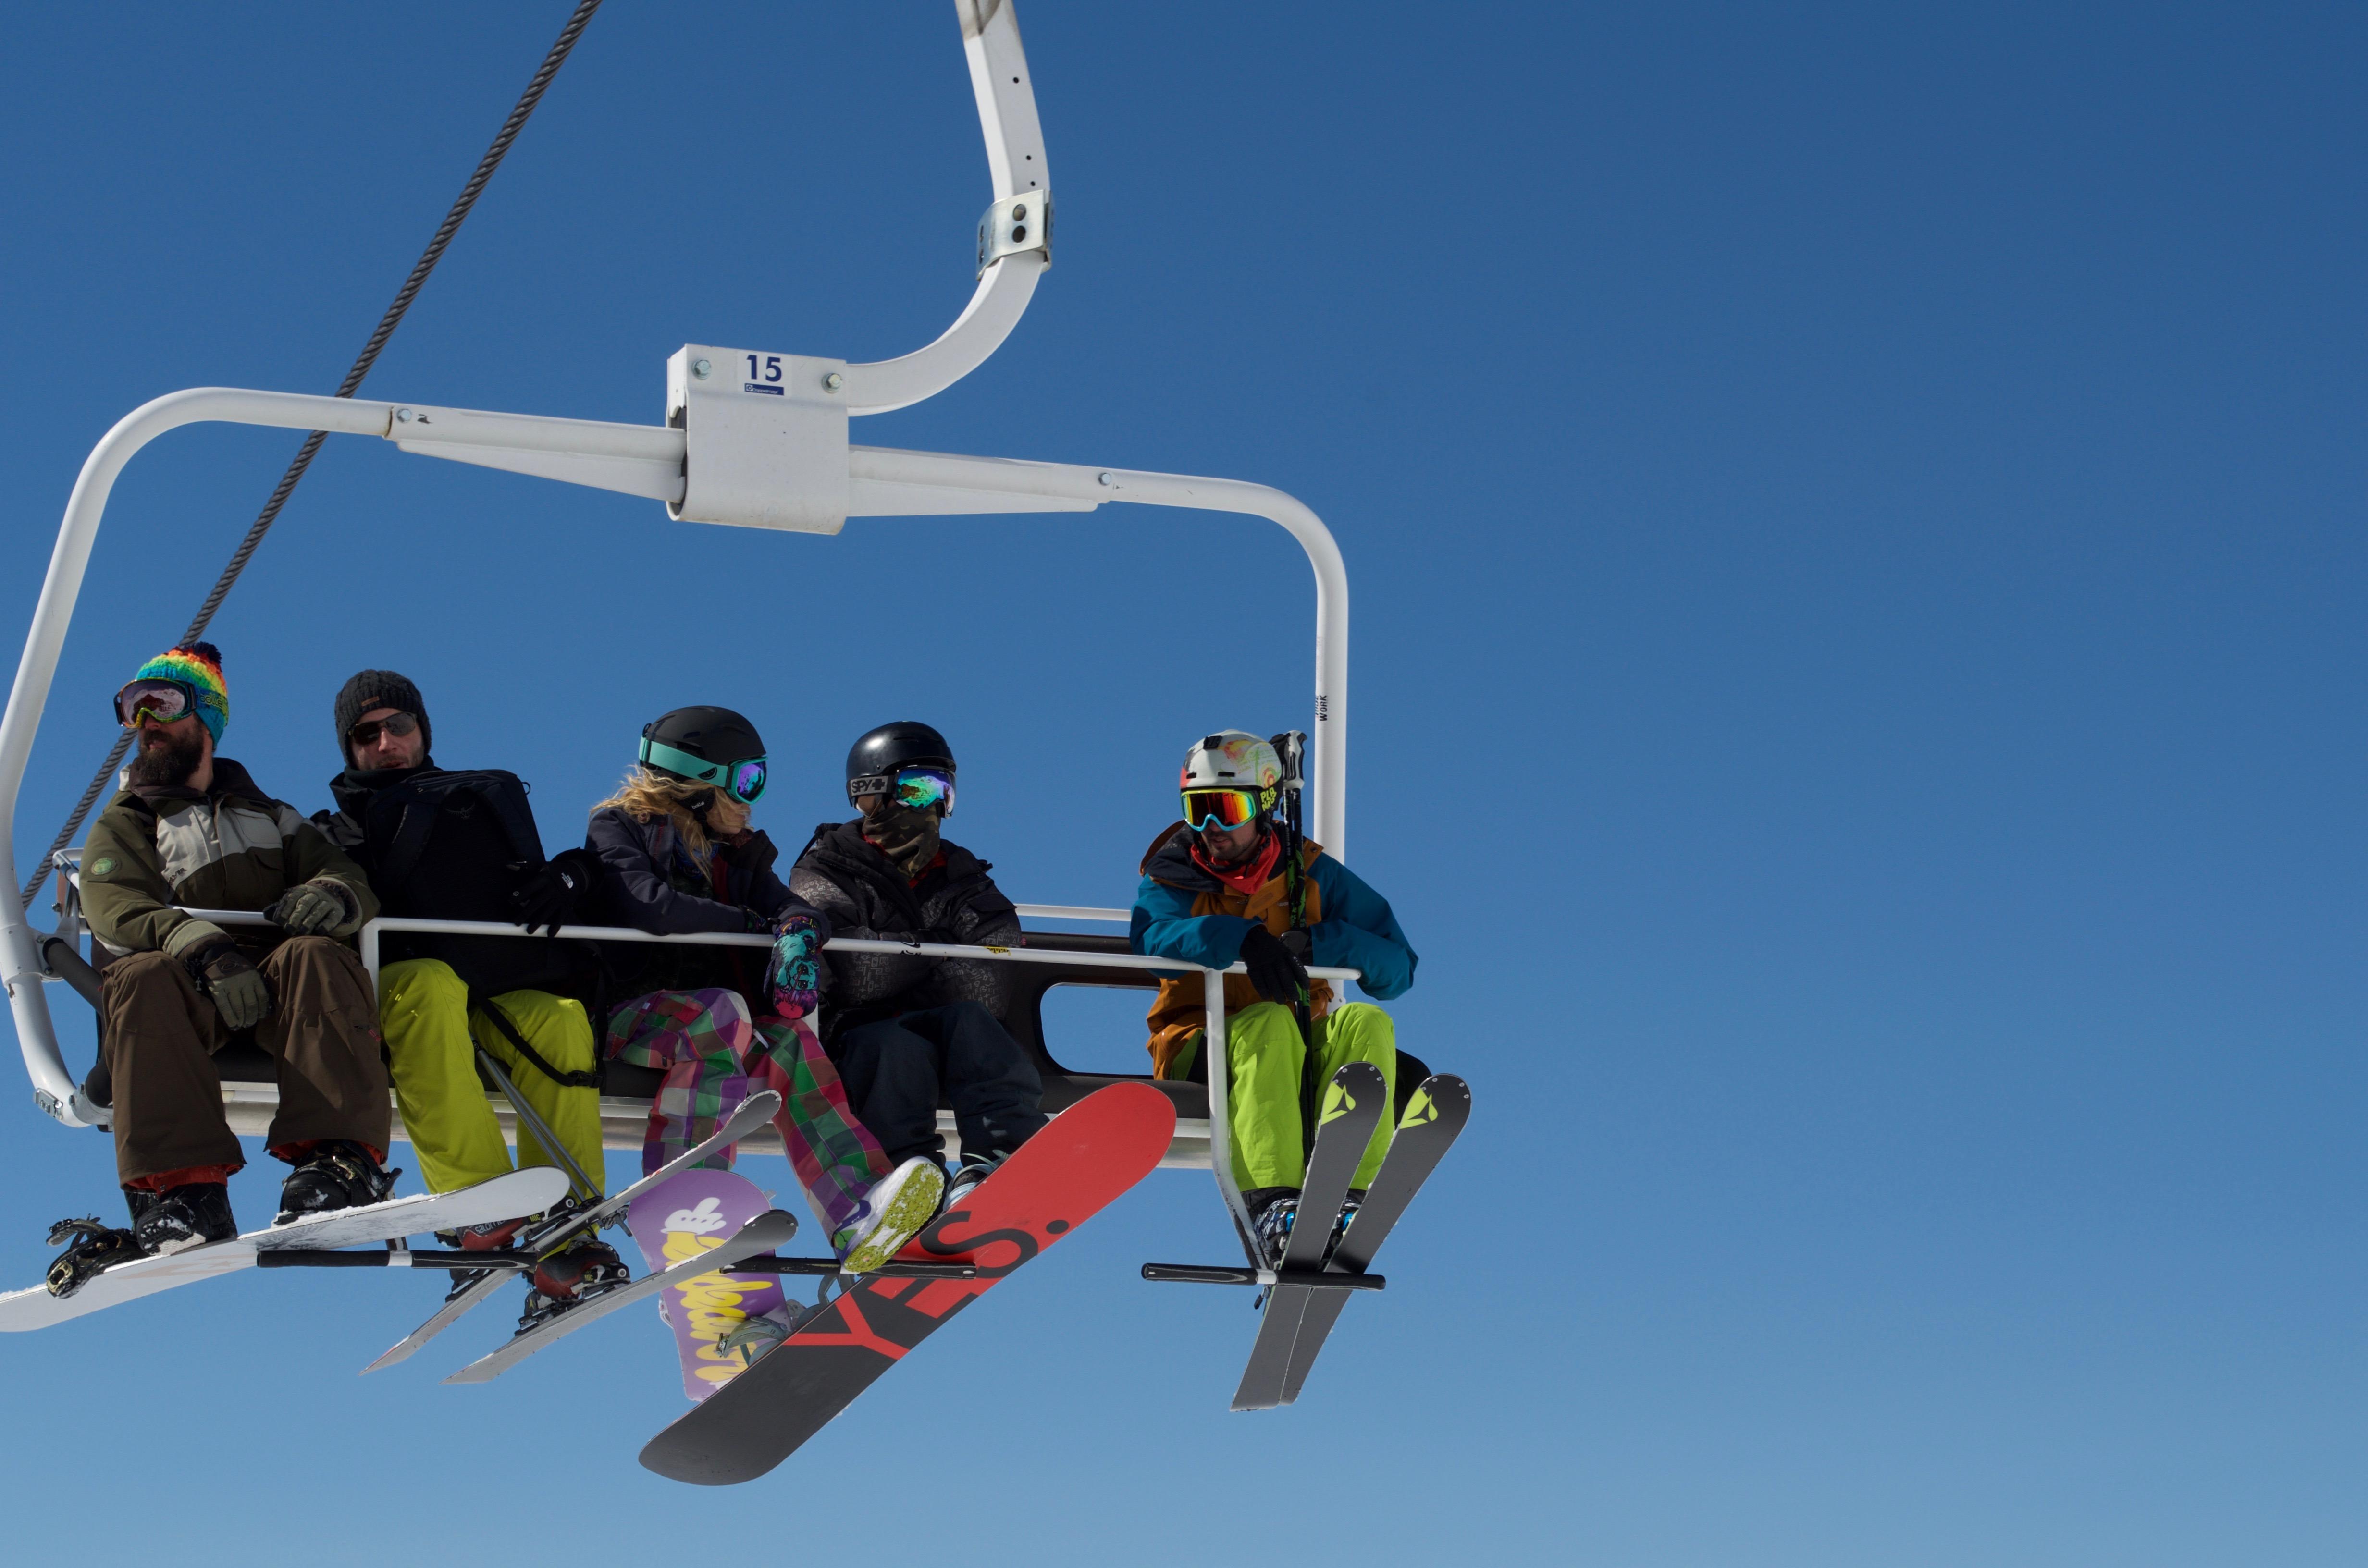 skiing in Andorra